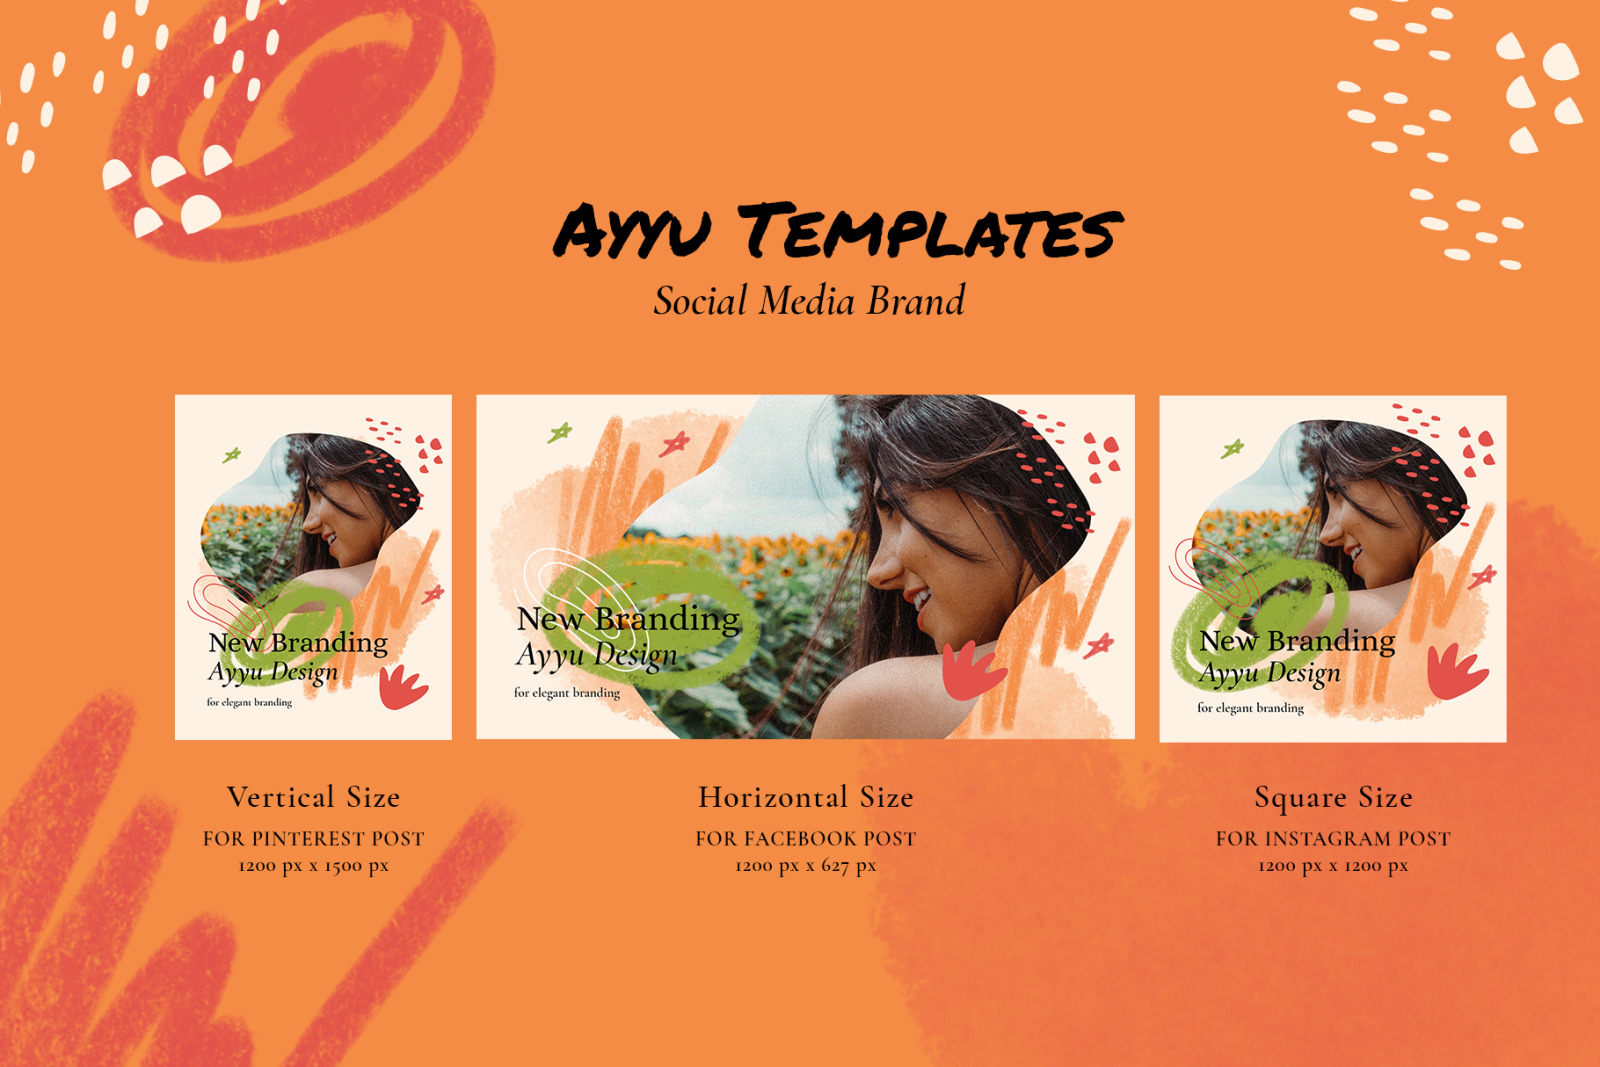 Ayyu - Social Media Brand Templates